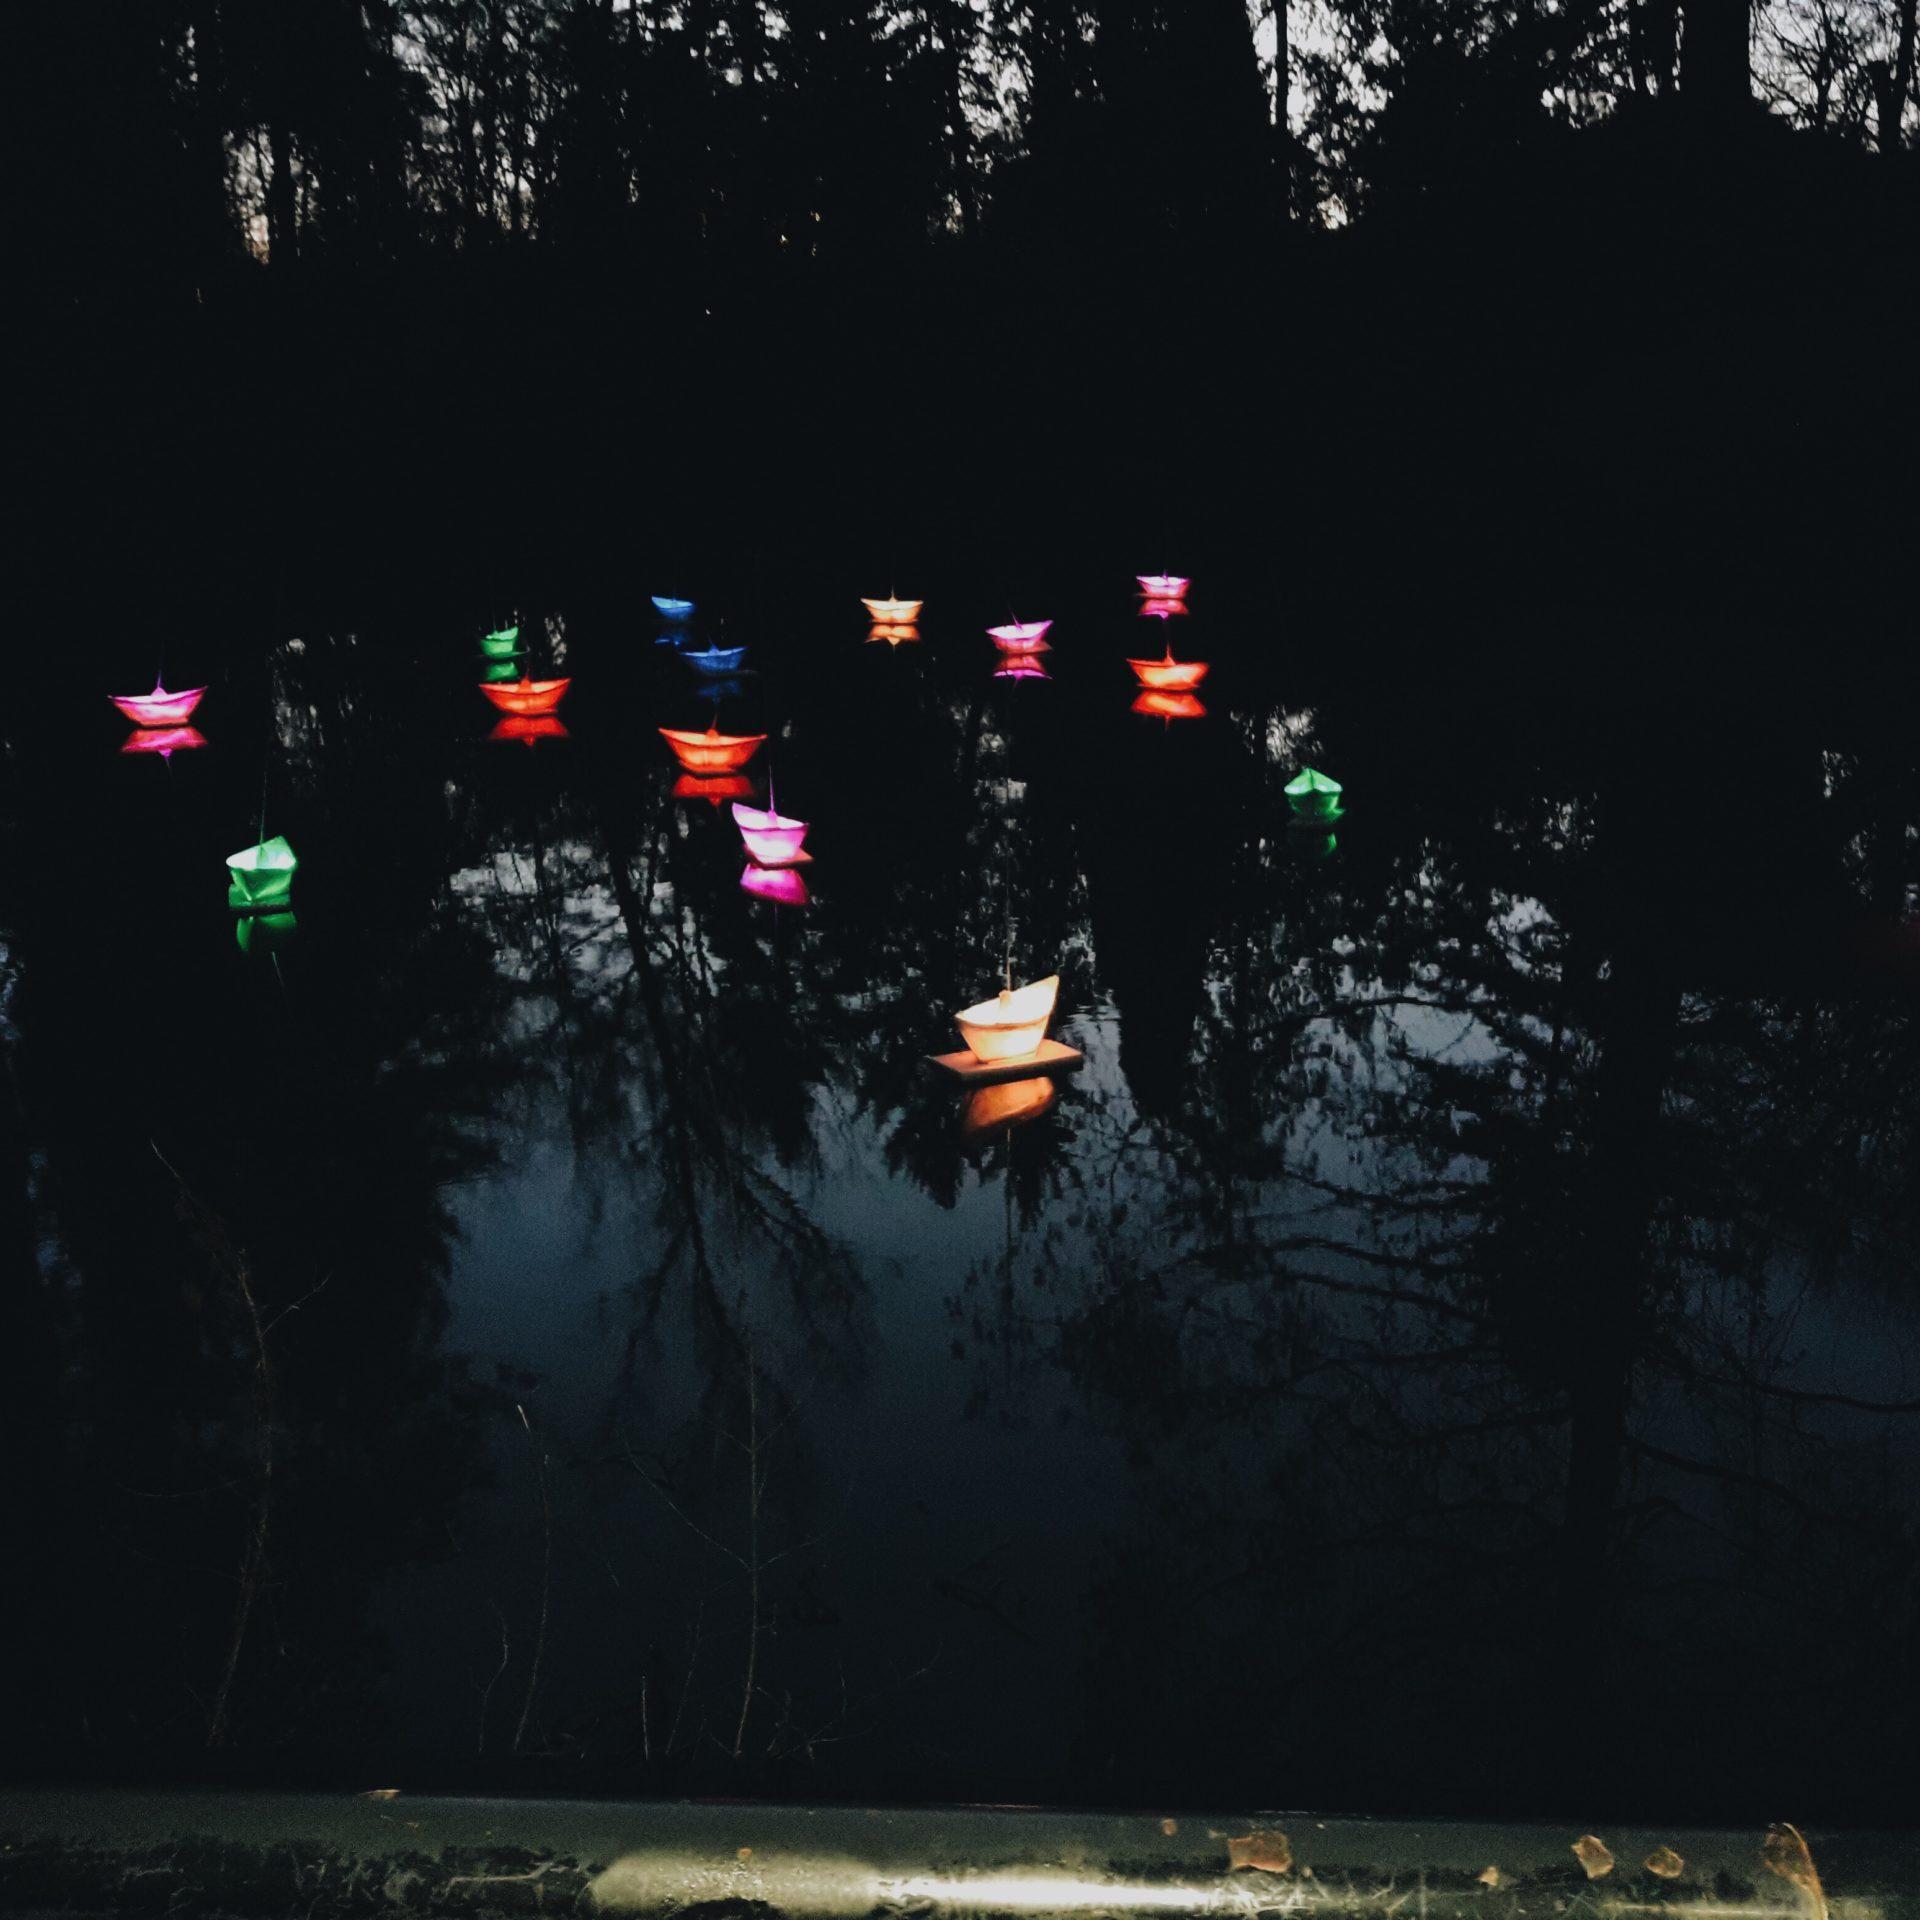 noel berlin : les bateaux illuminés